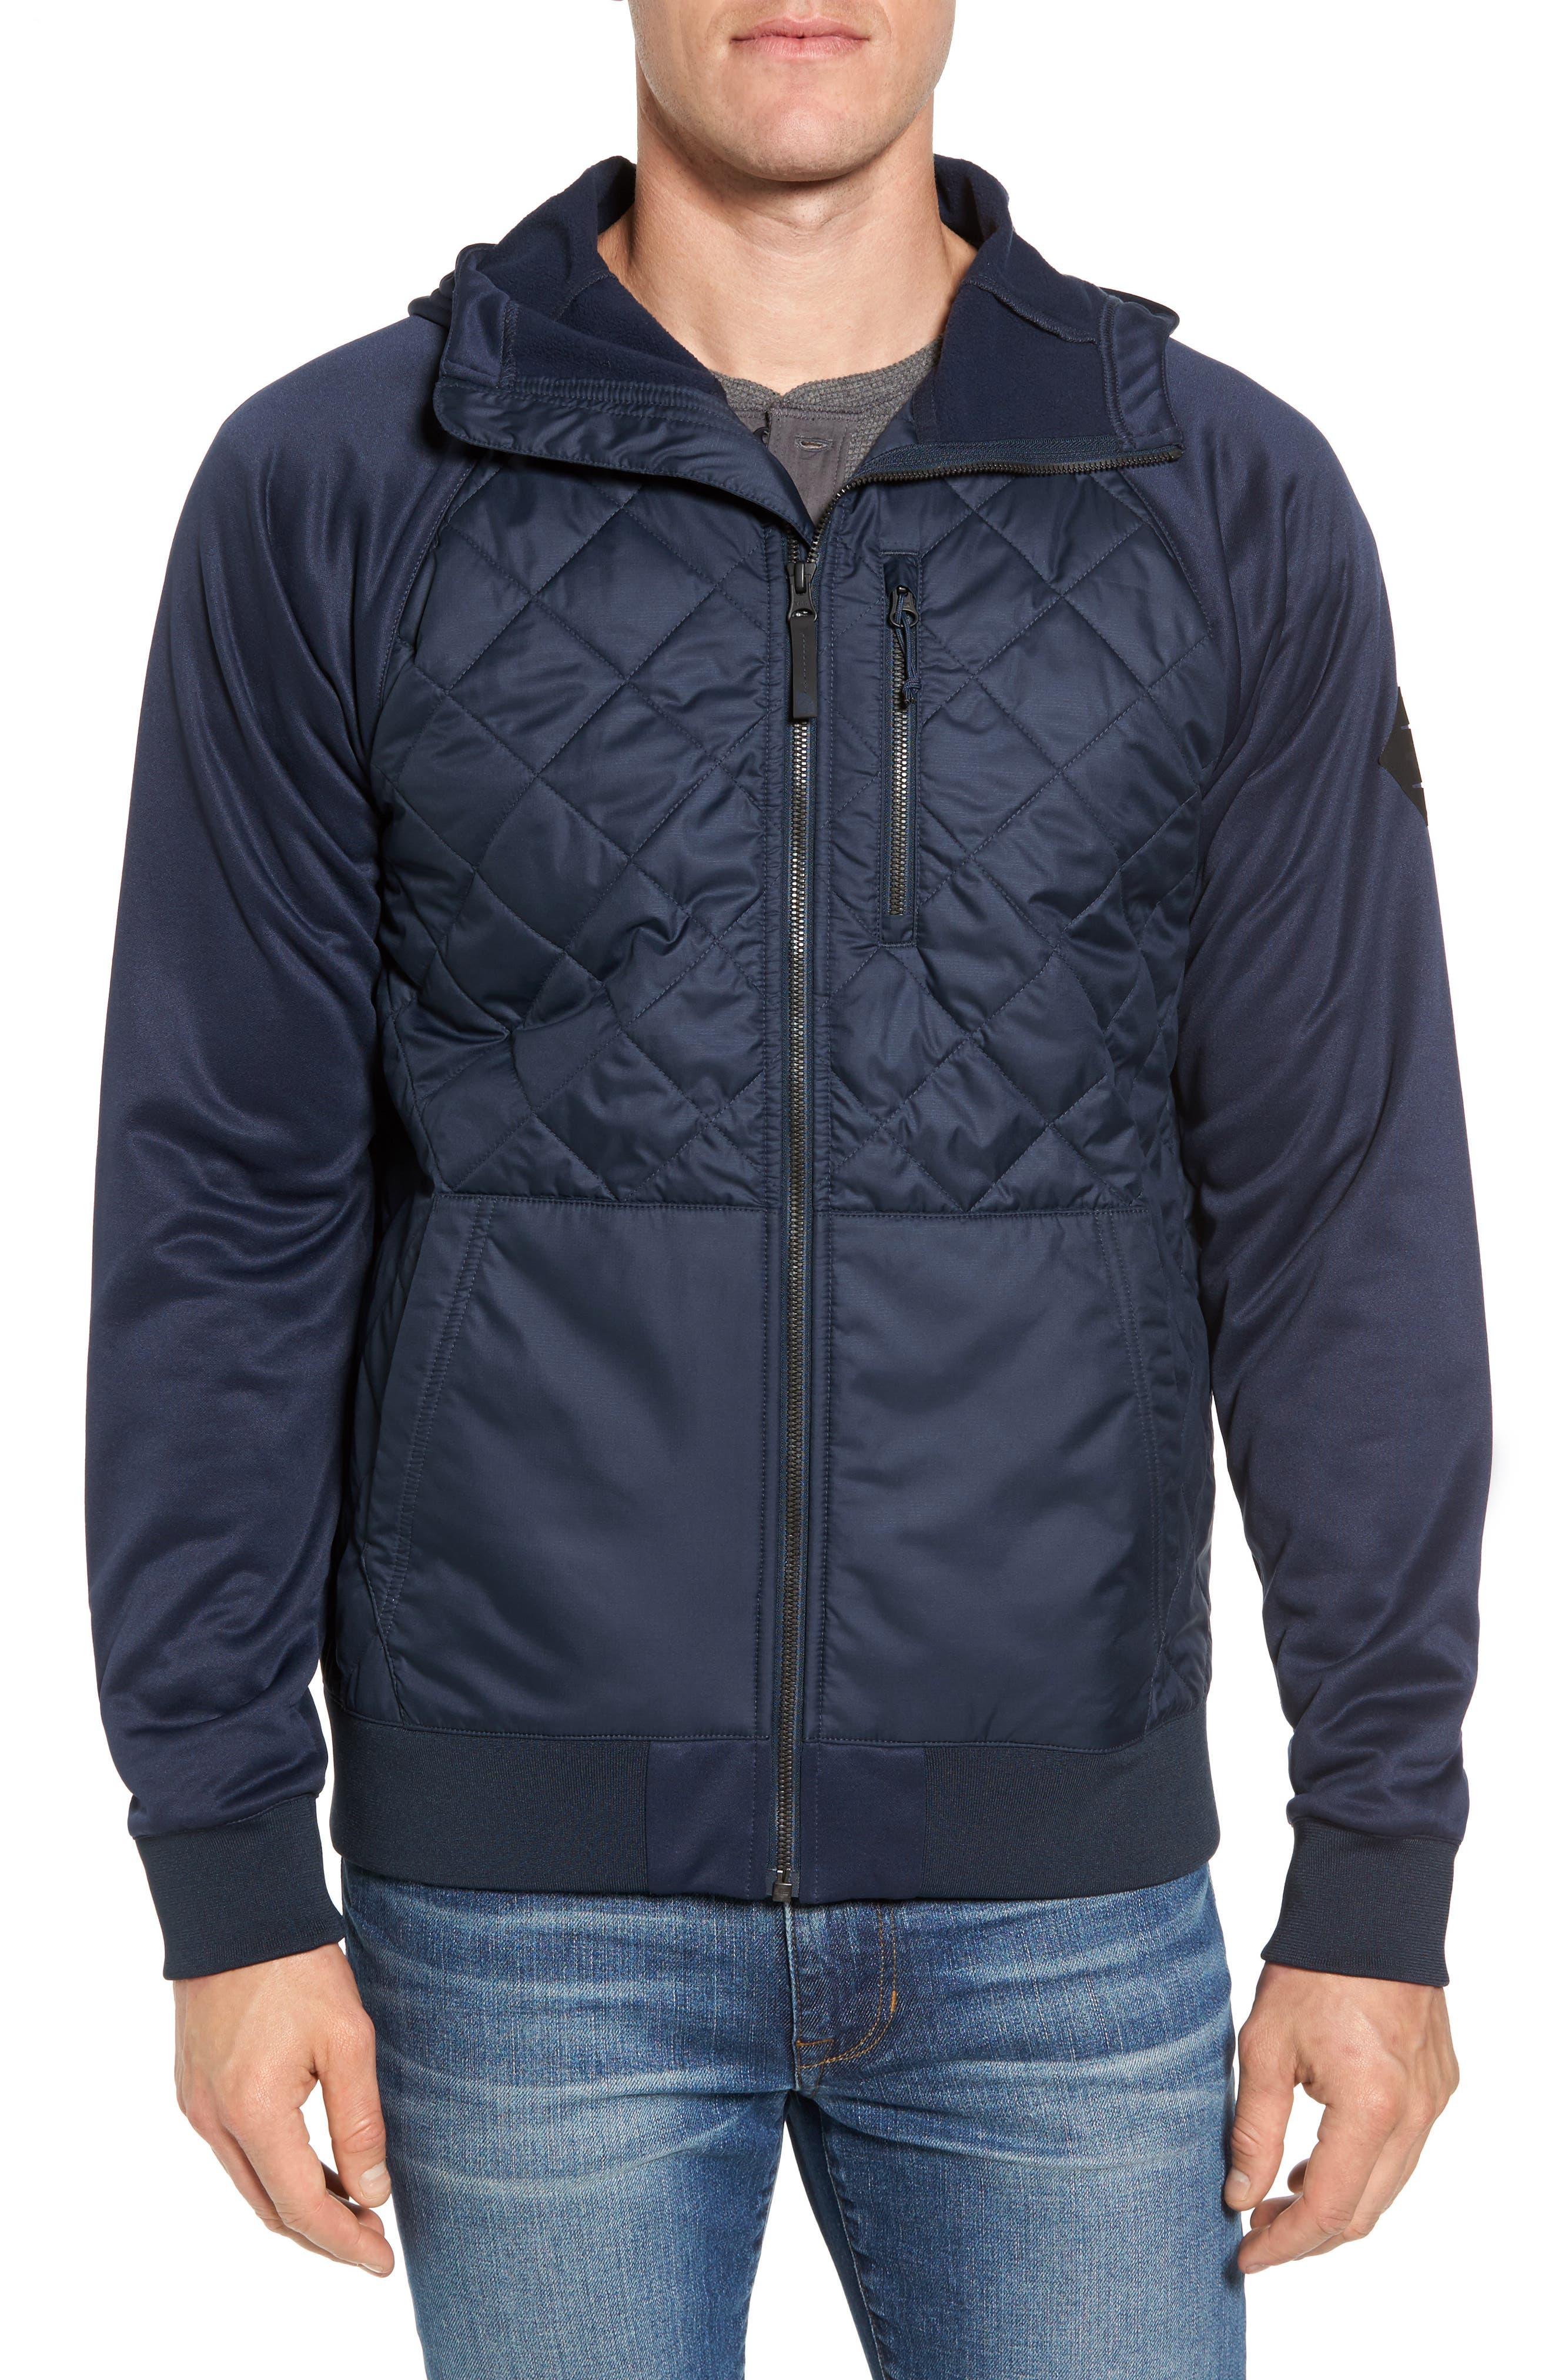 Pilsen Hybrid Jacket,                         Main,                         color, Urban Navy